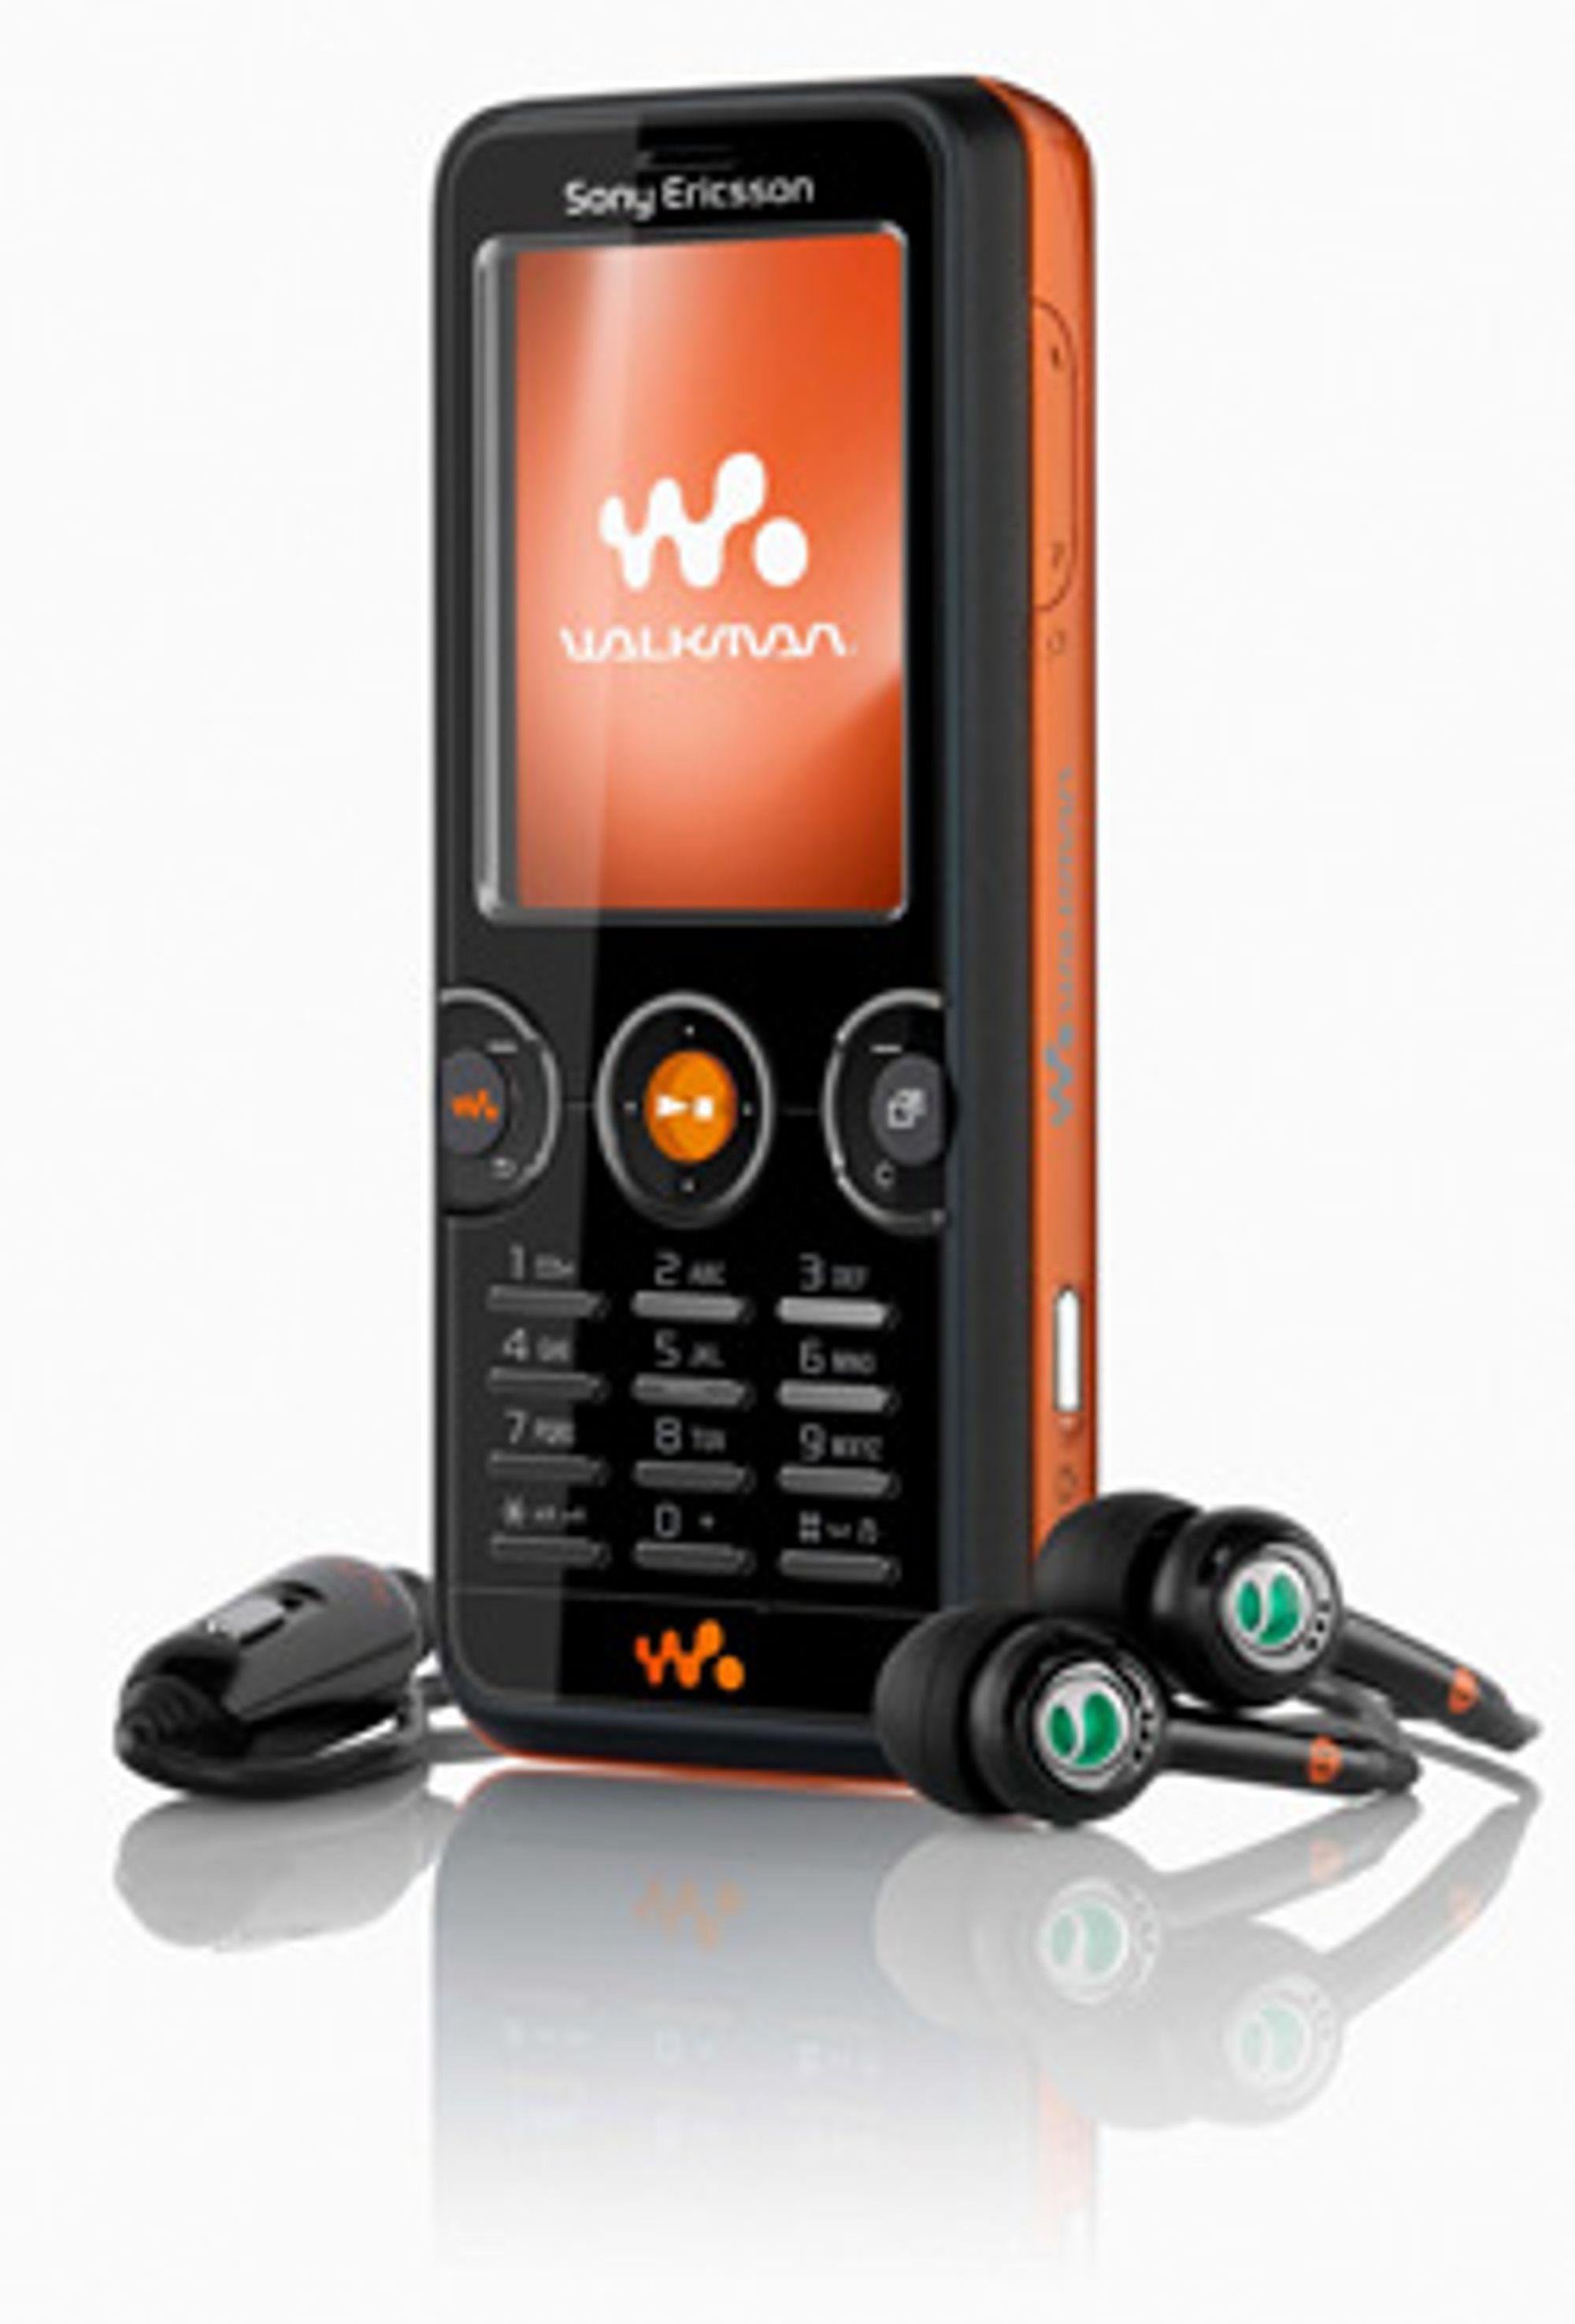 Sony Ericssons nye Walkman-mobil.